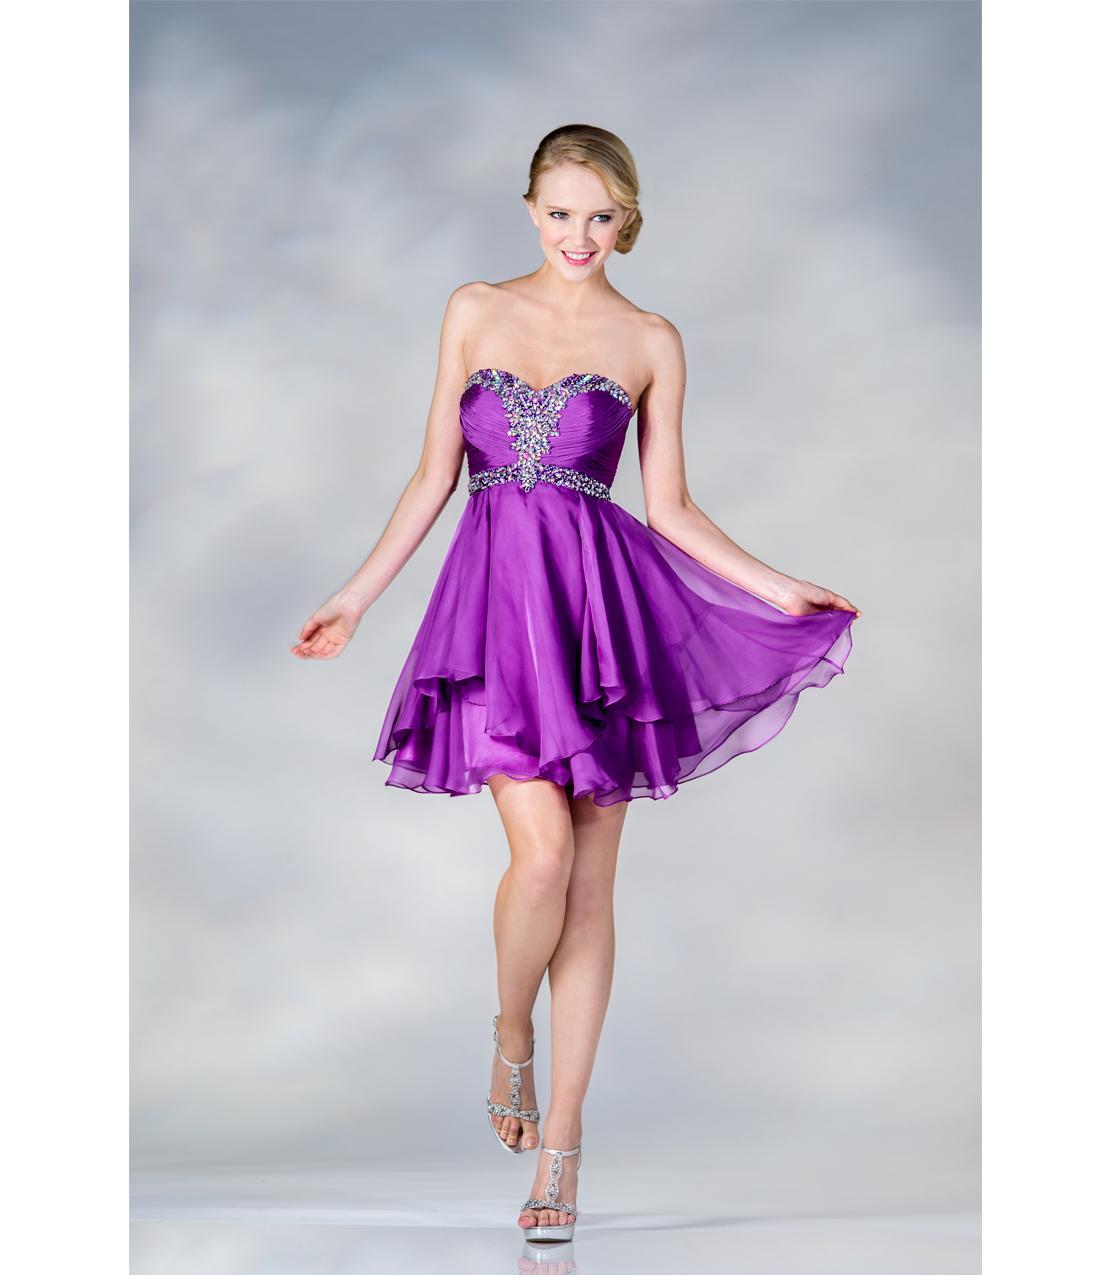 Short Formal Purple Dresses Image Collections Design Ideas